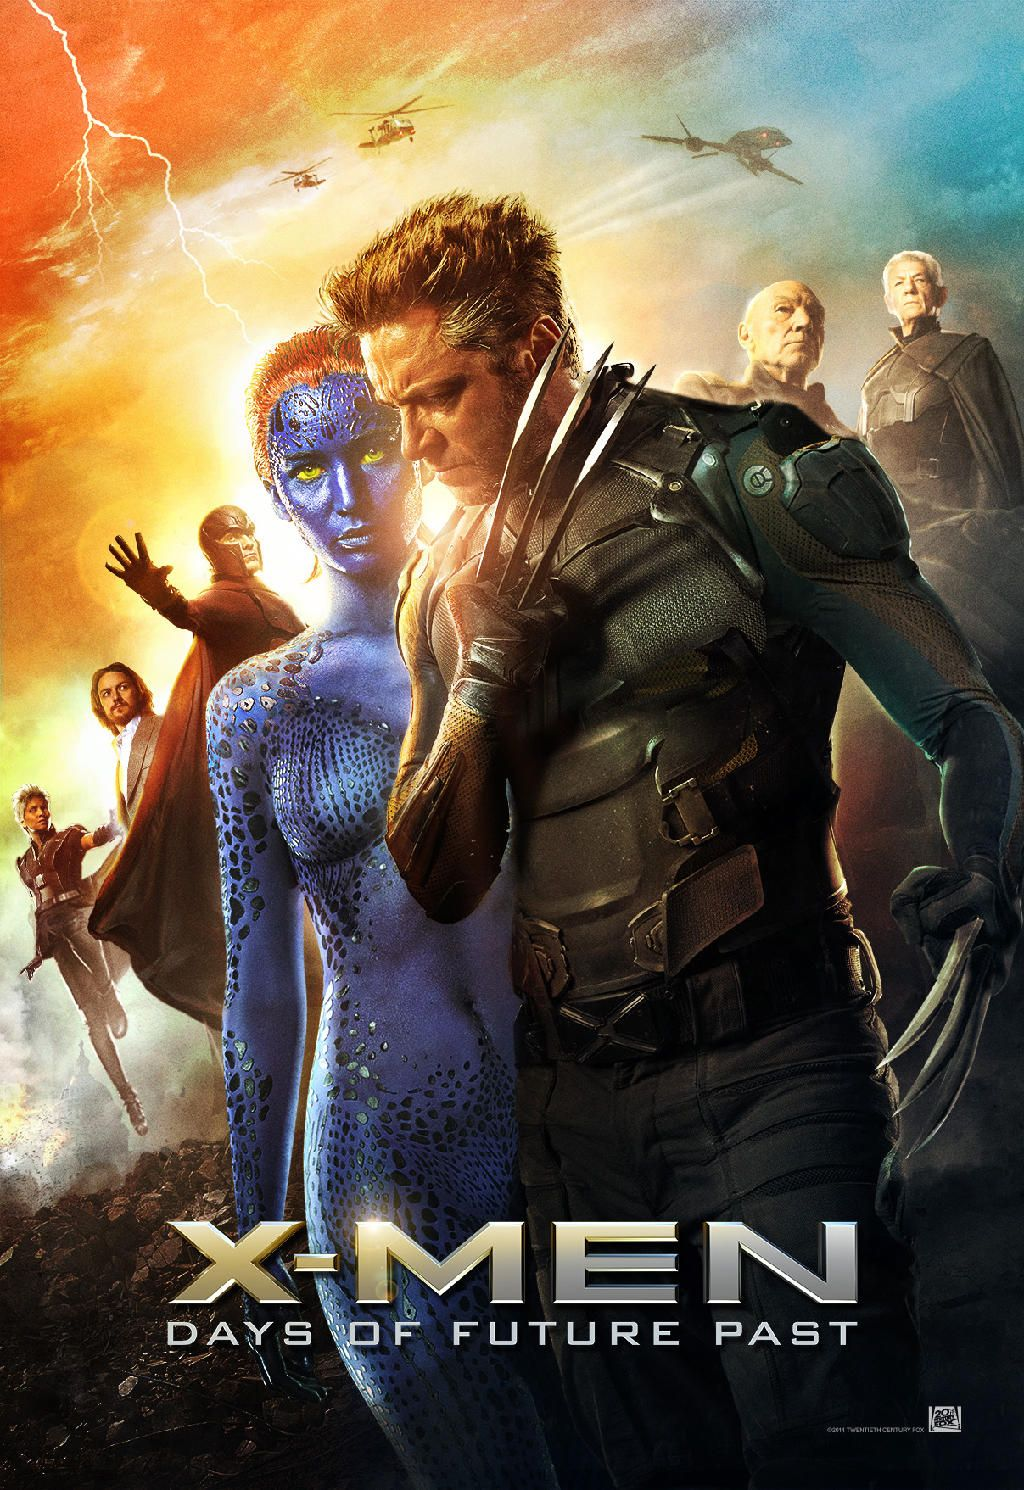 xmen days of future past poster storm prof x magneto